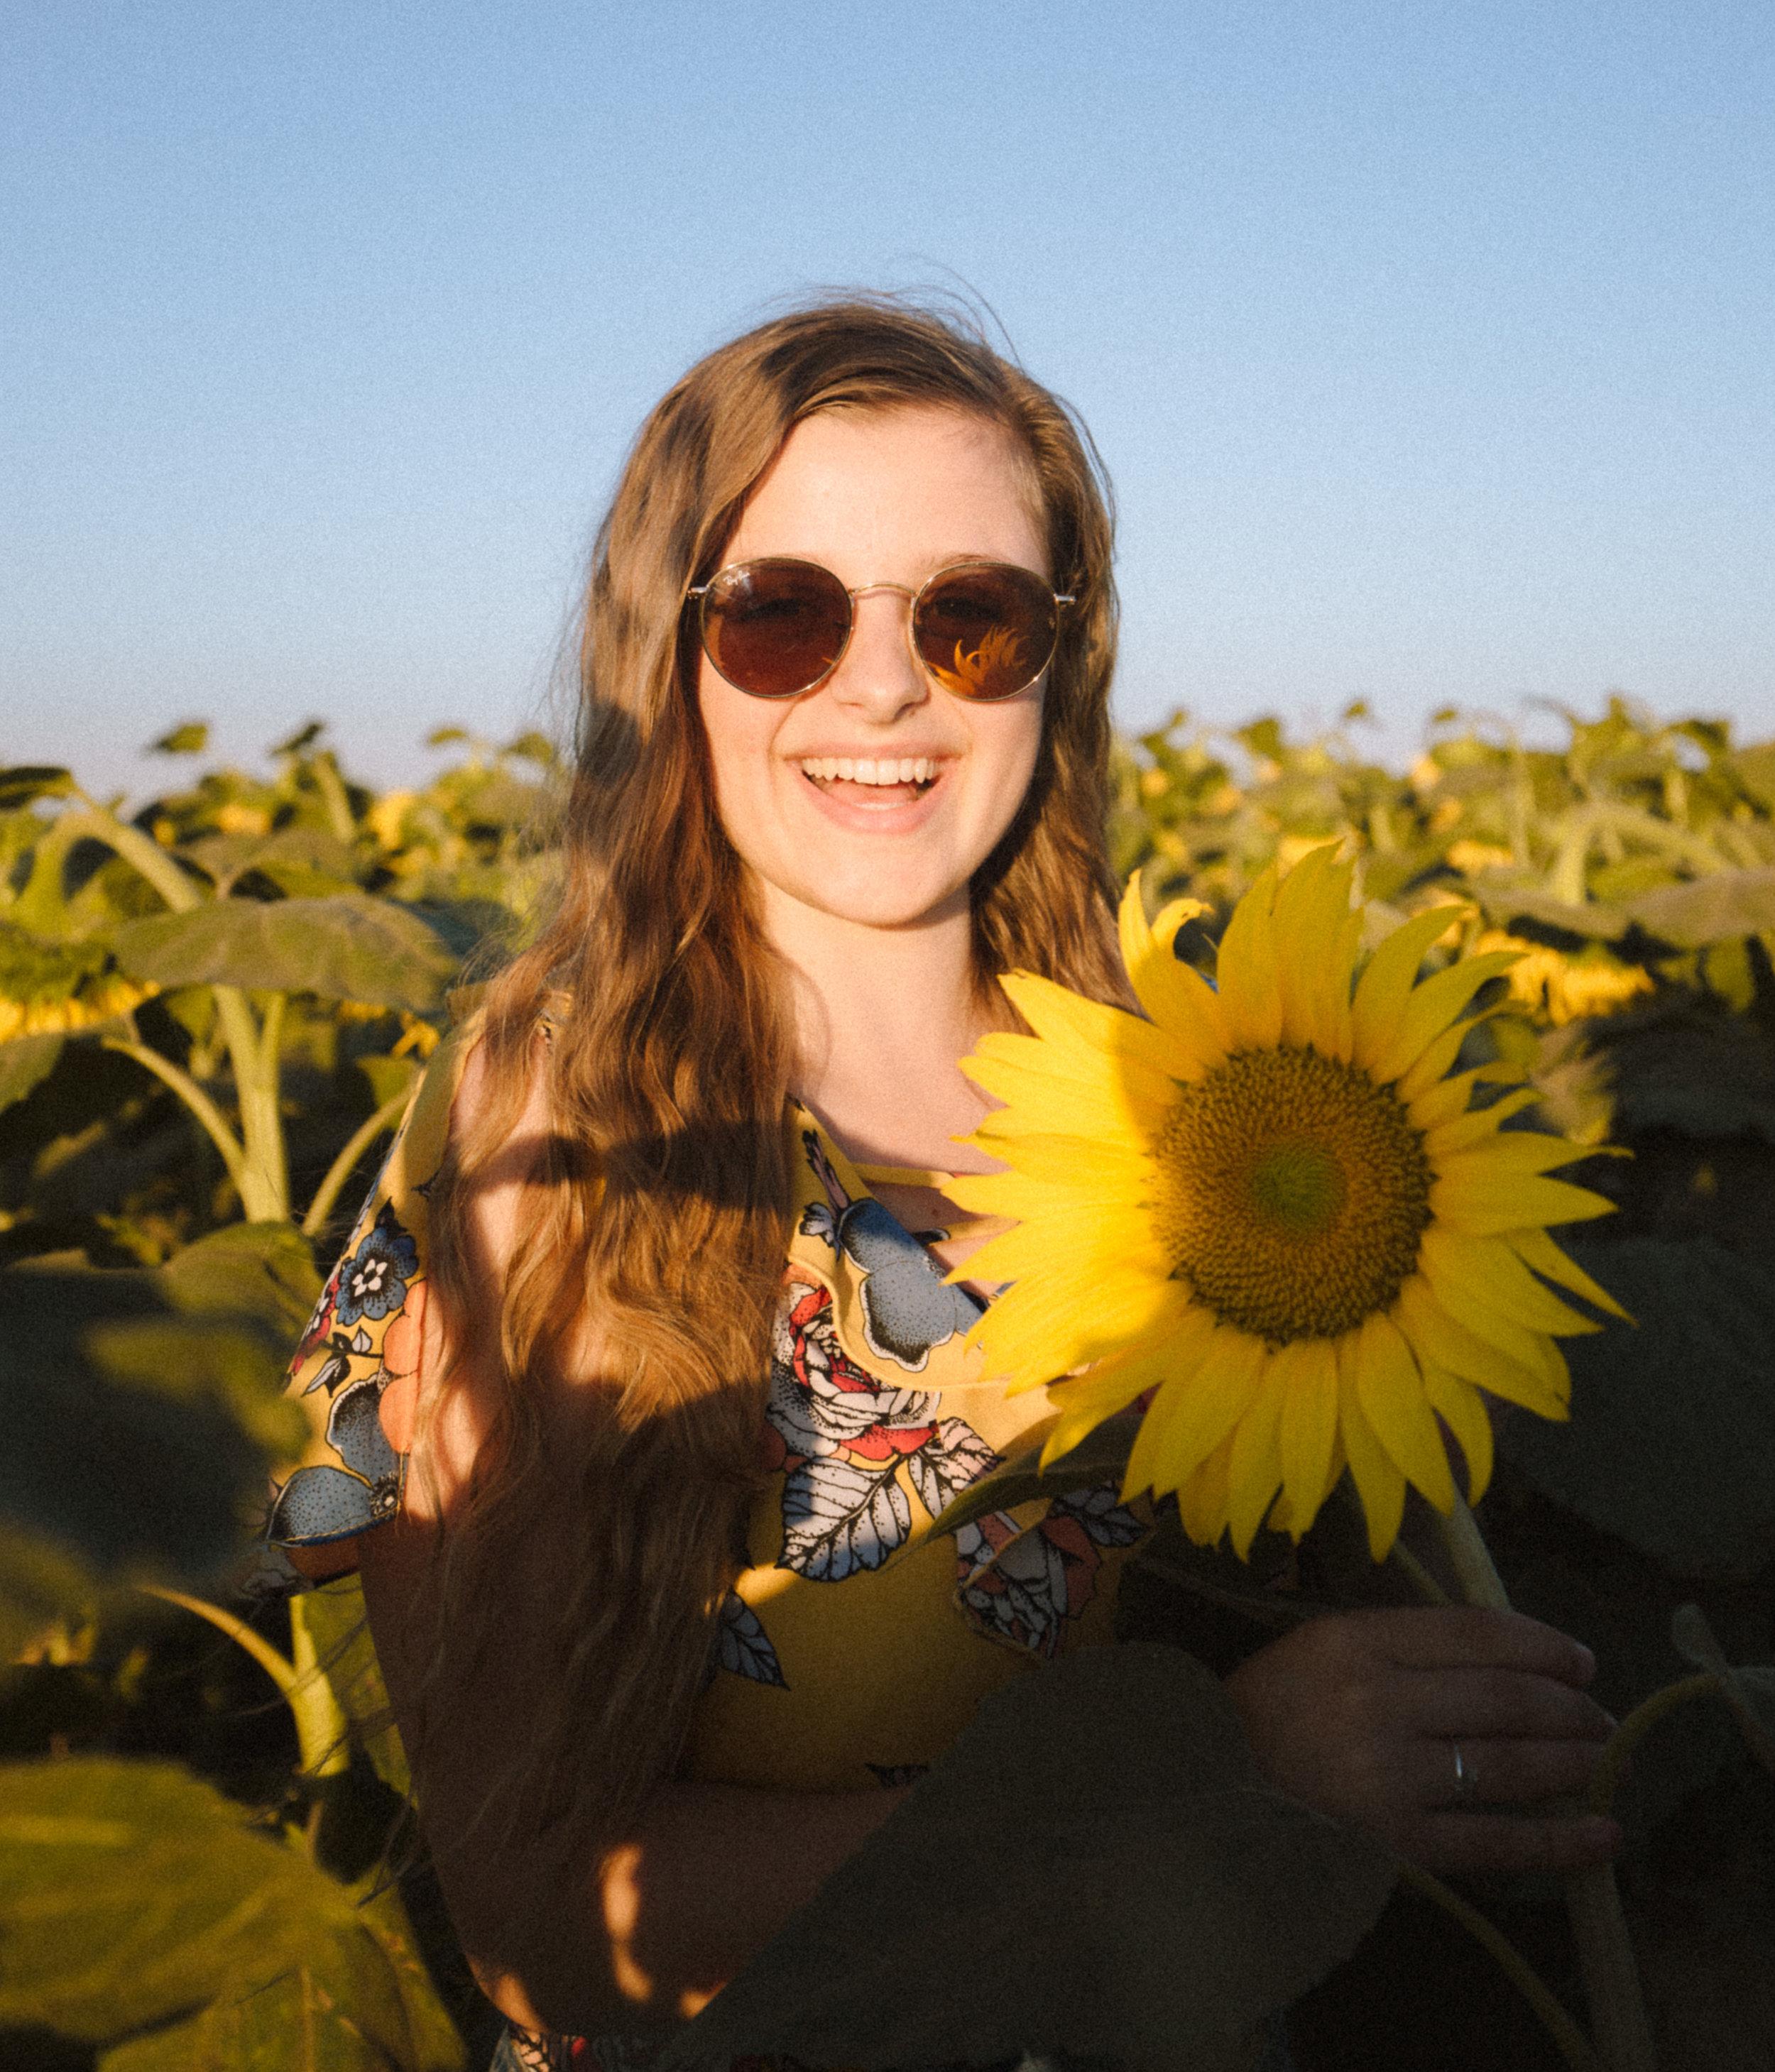 sunflowermeetup-21.jpg